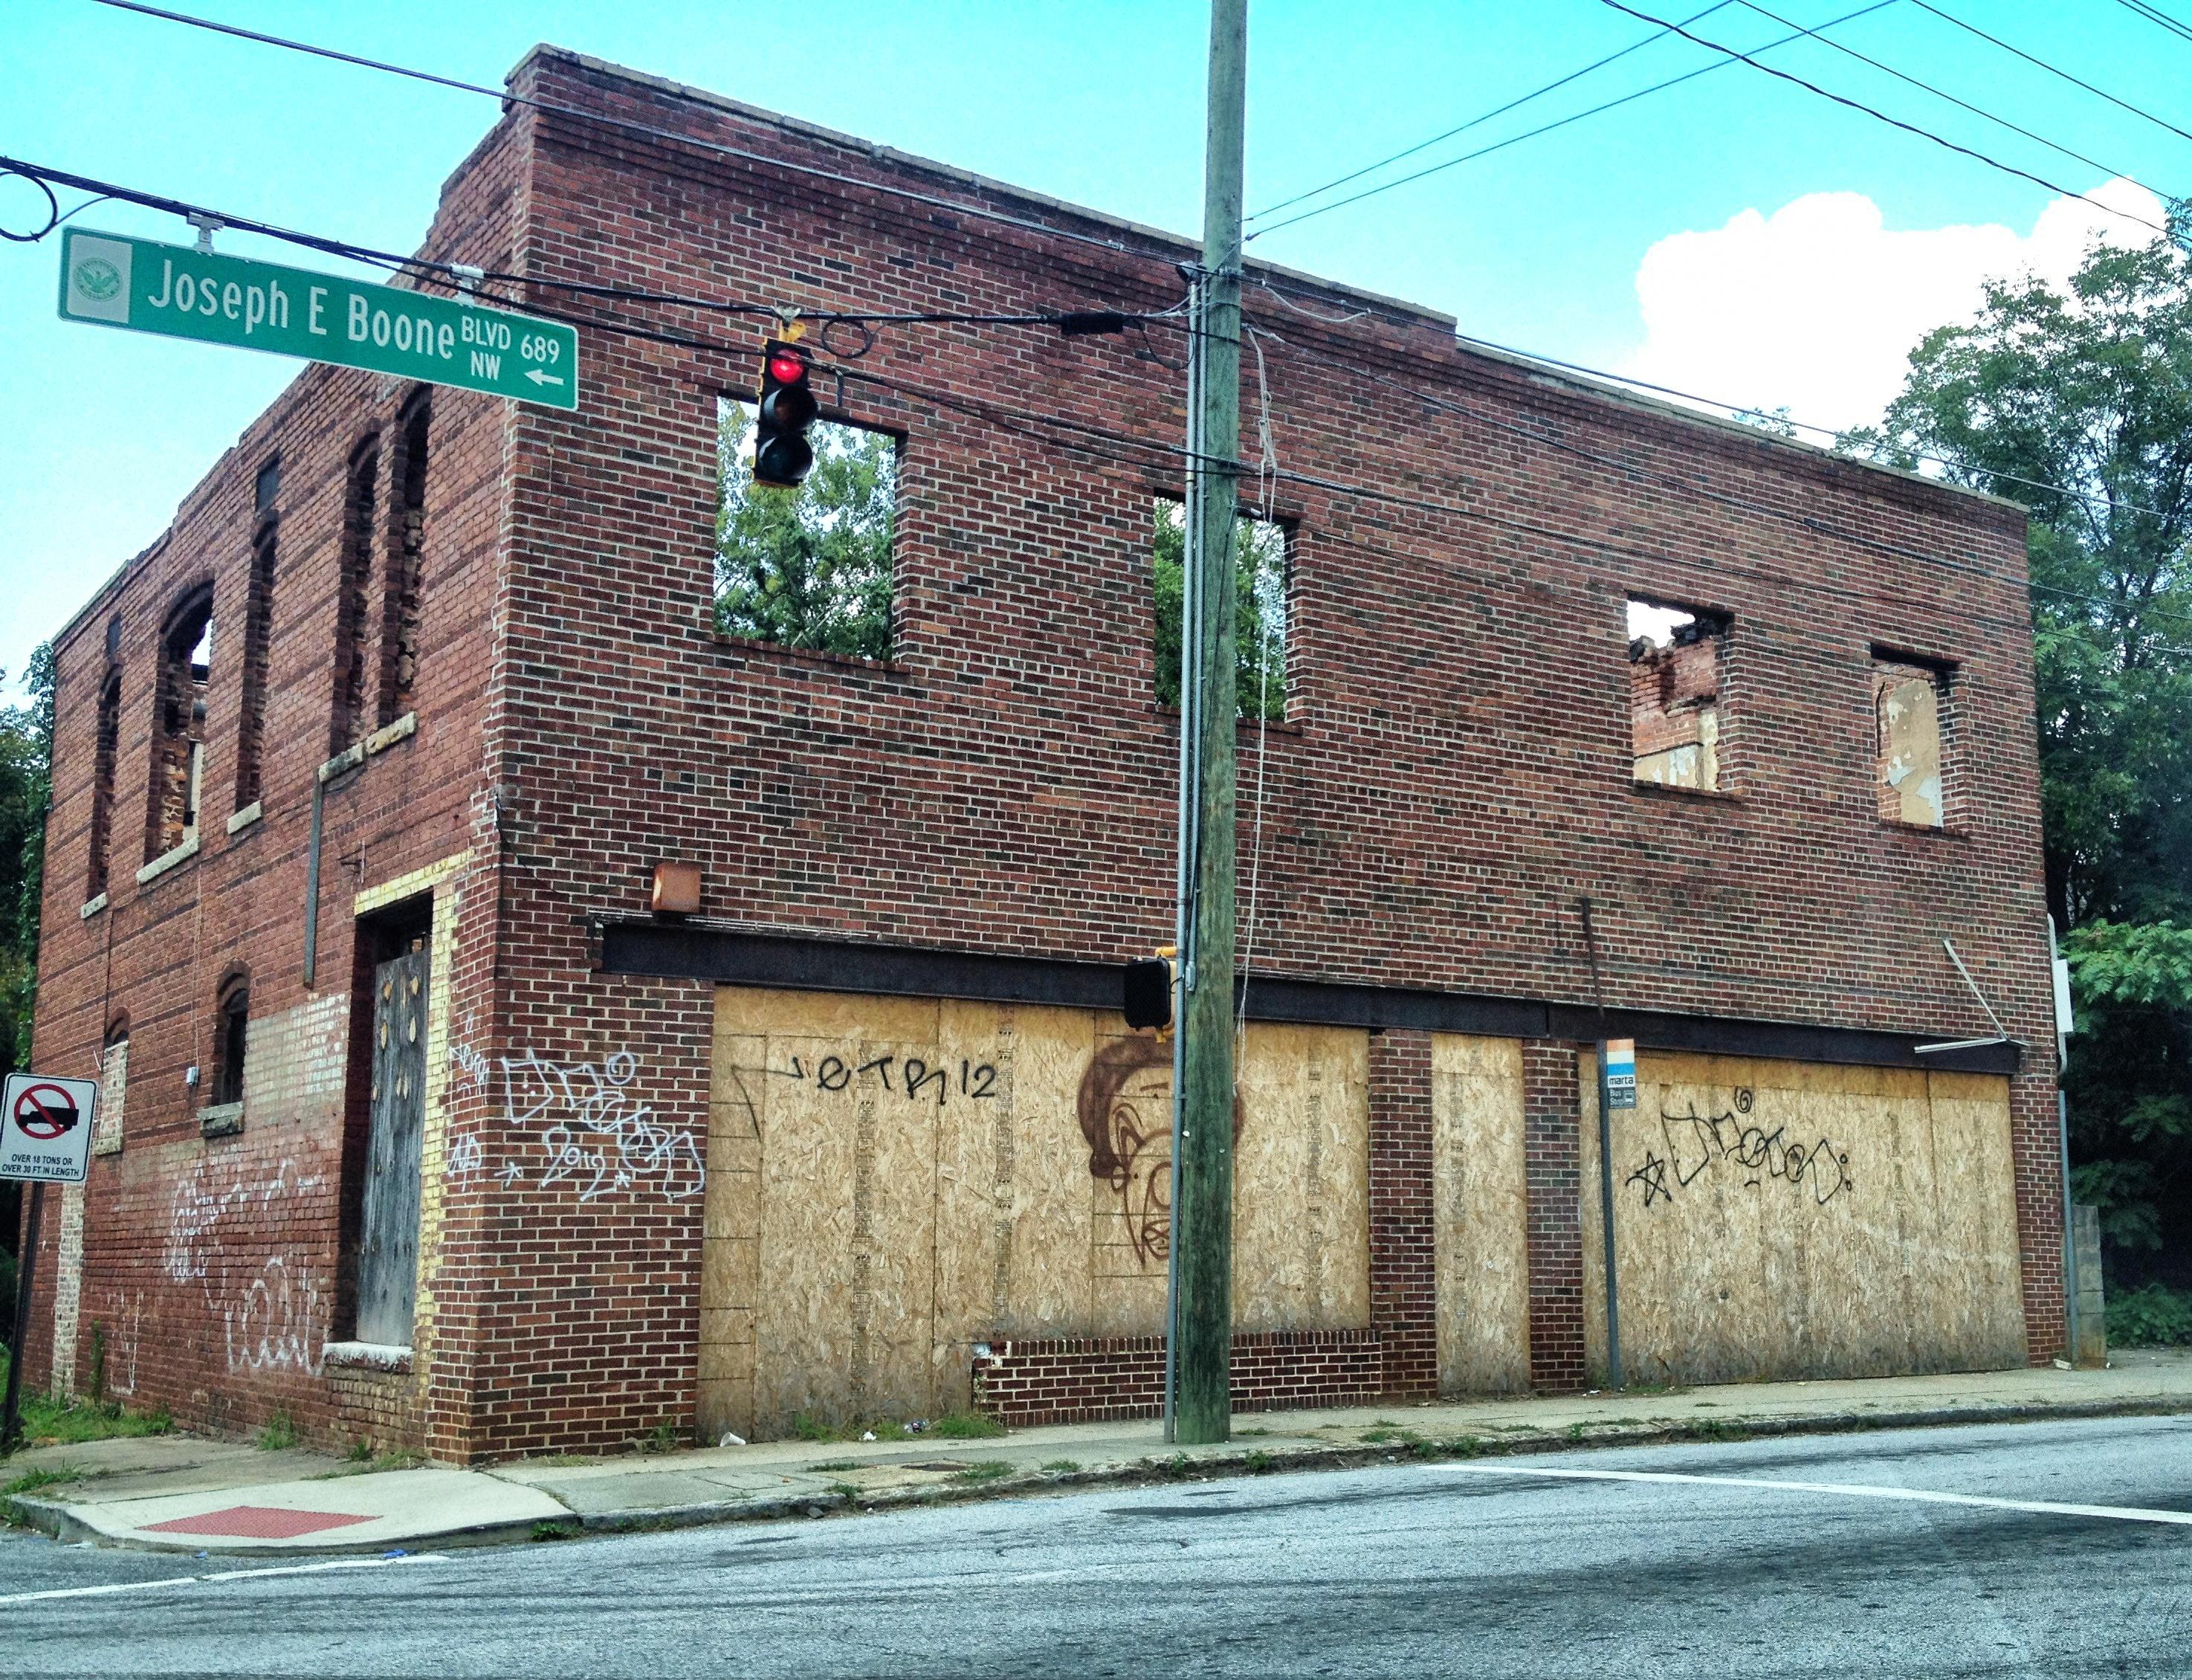 Abandoned_building,_Joseph_E._Boone_Blvd